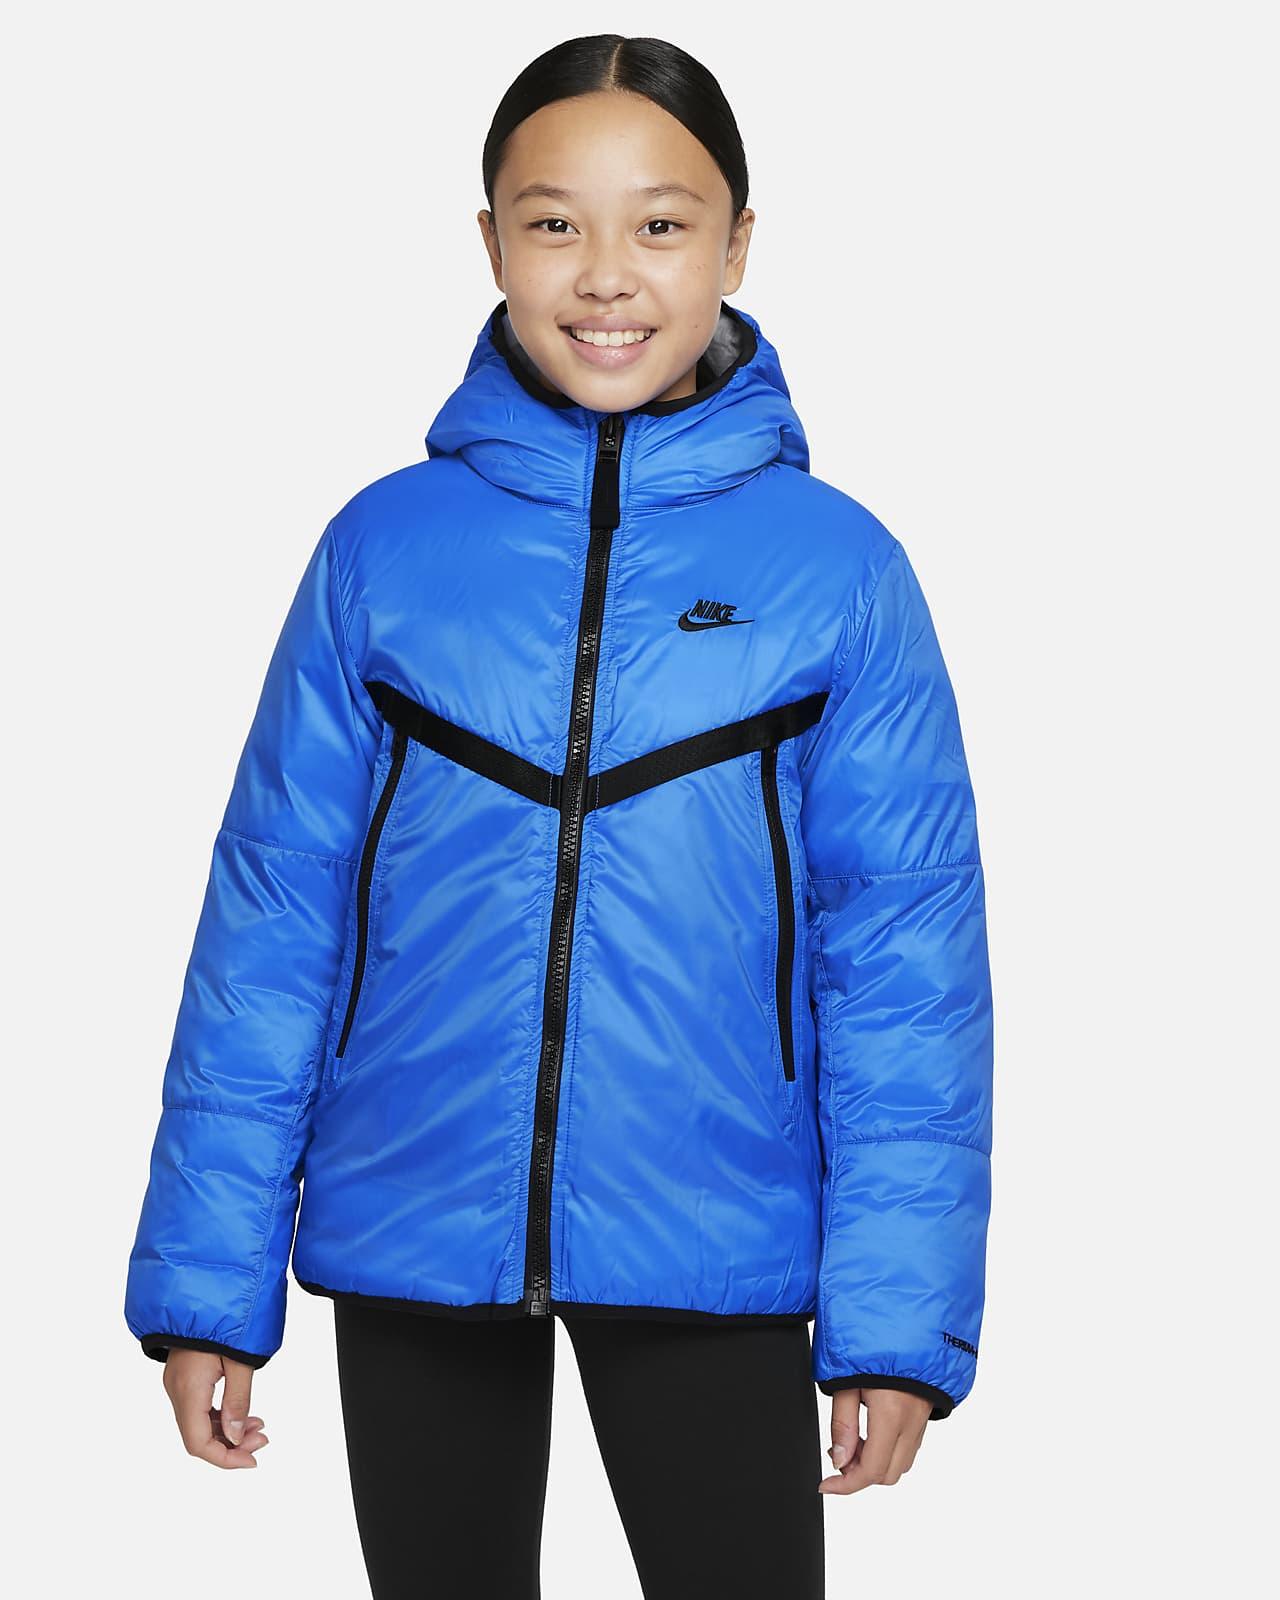 Куртка с синтетическим наполнителем для школьников Windrunner Nike Sportswear Therma-FIT